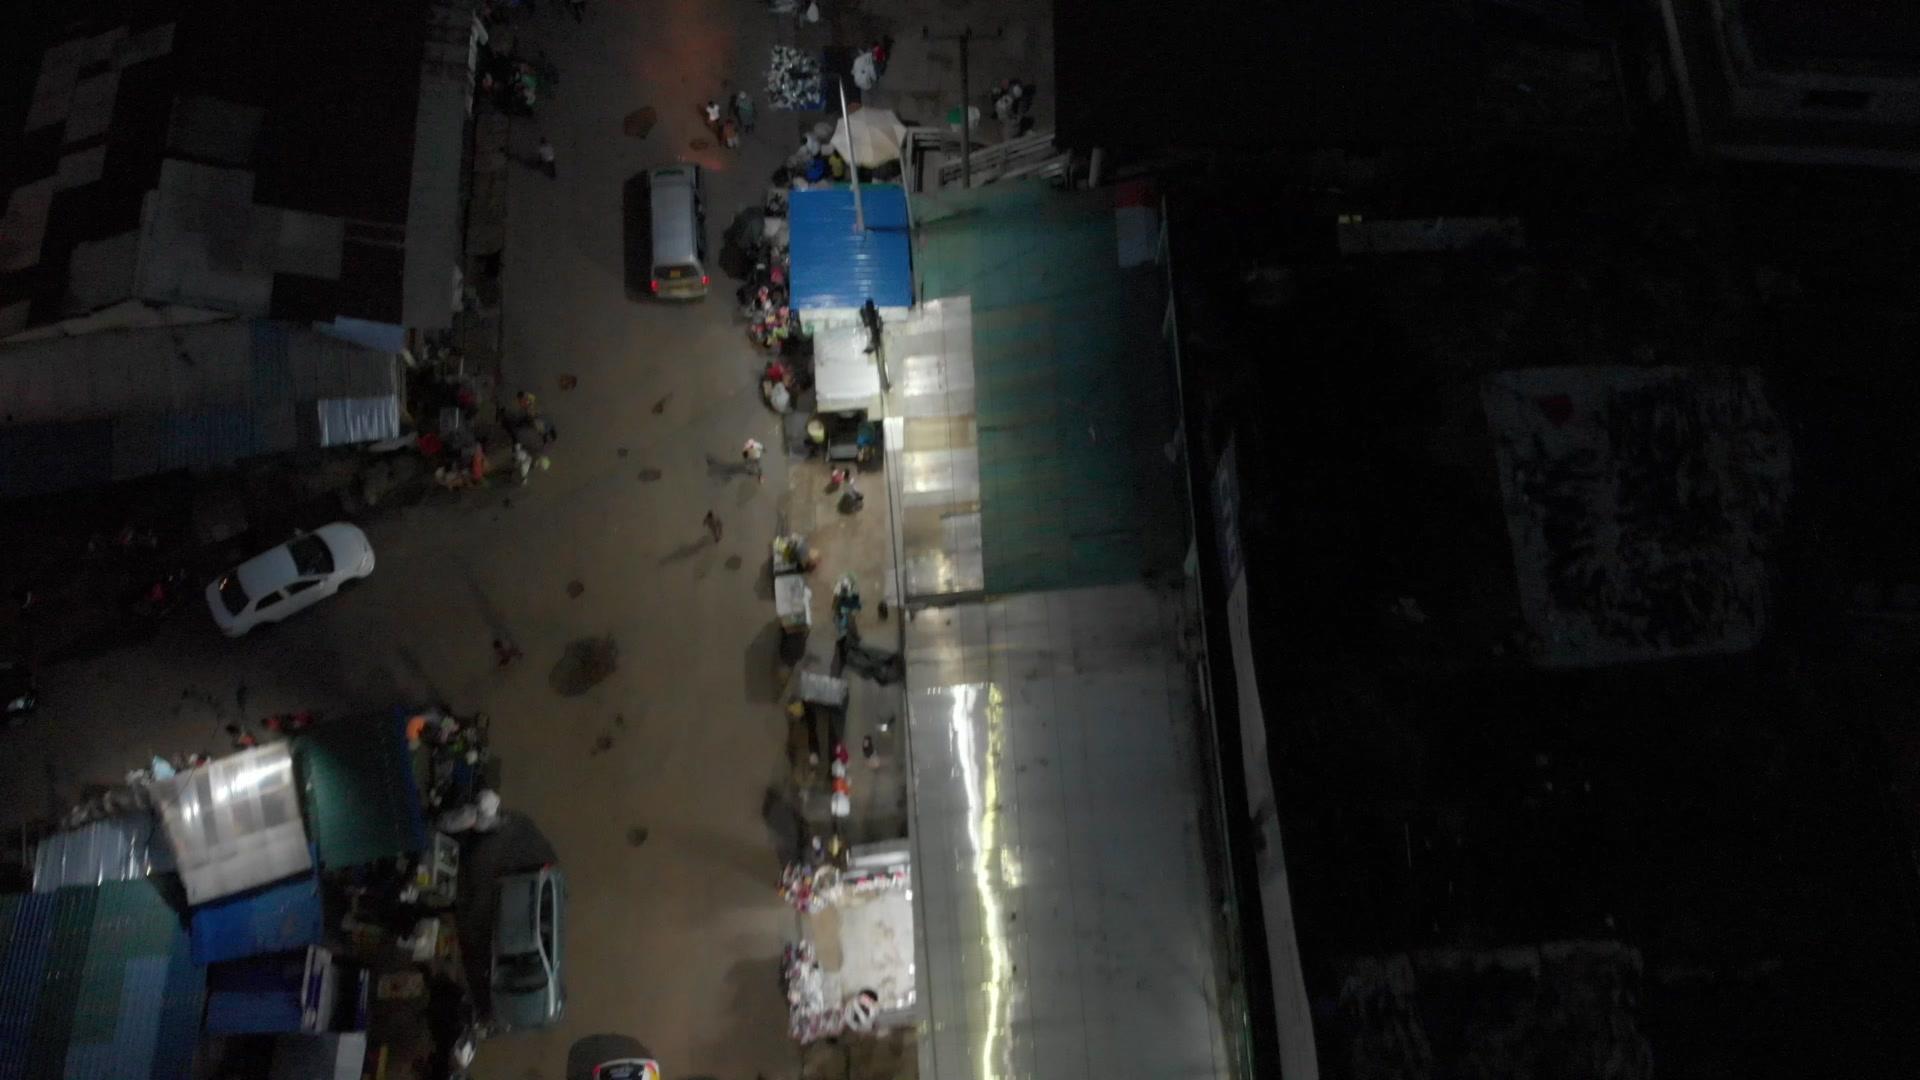 Koforidua Night Street Reverse Reveal Top Down View Cars Traffic Station